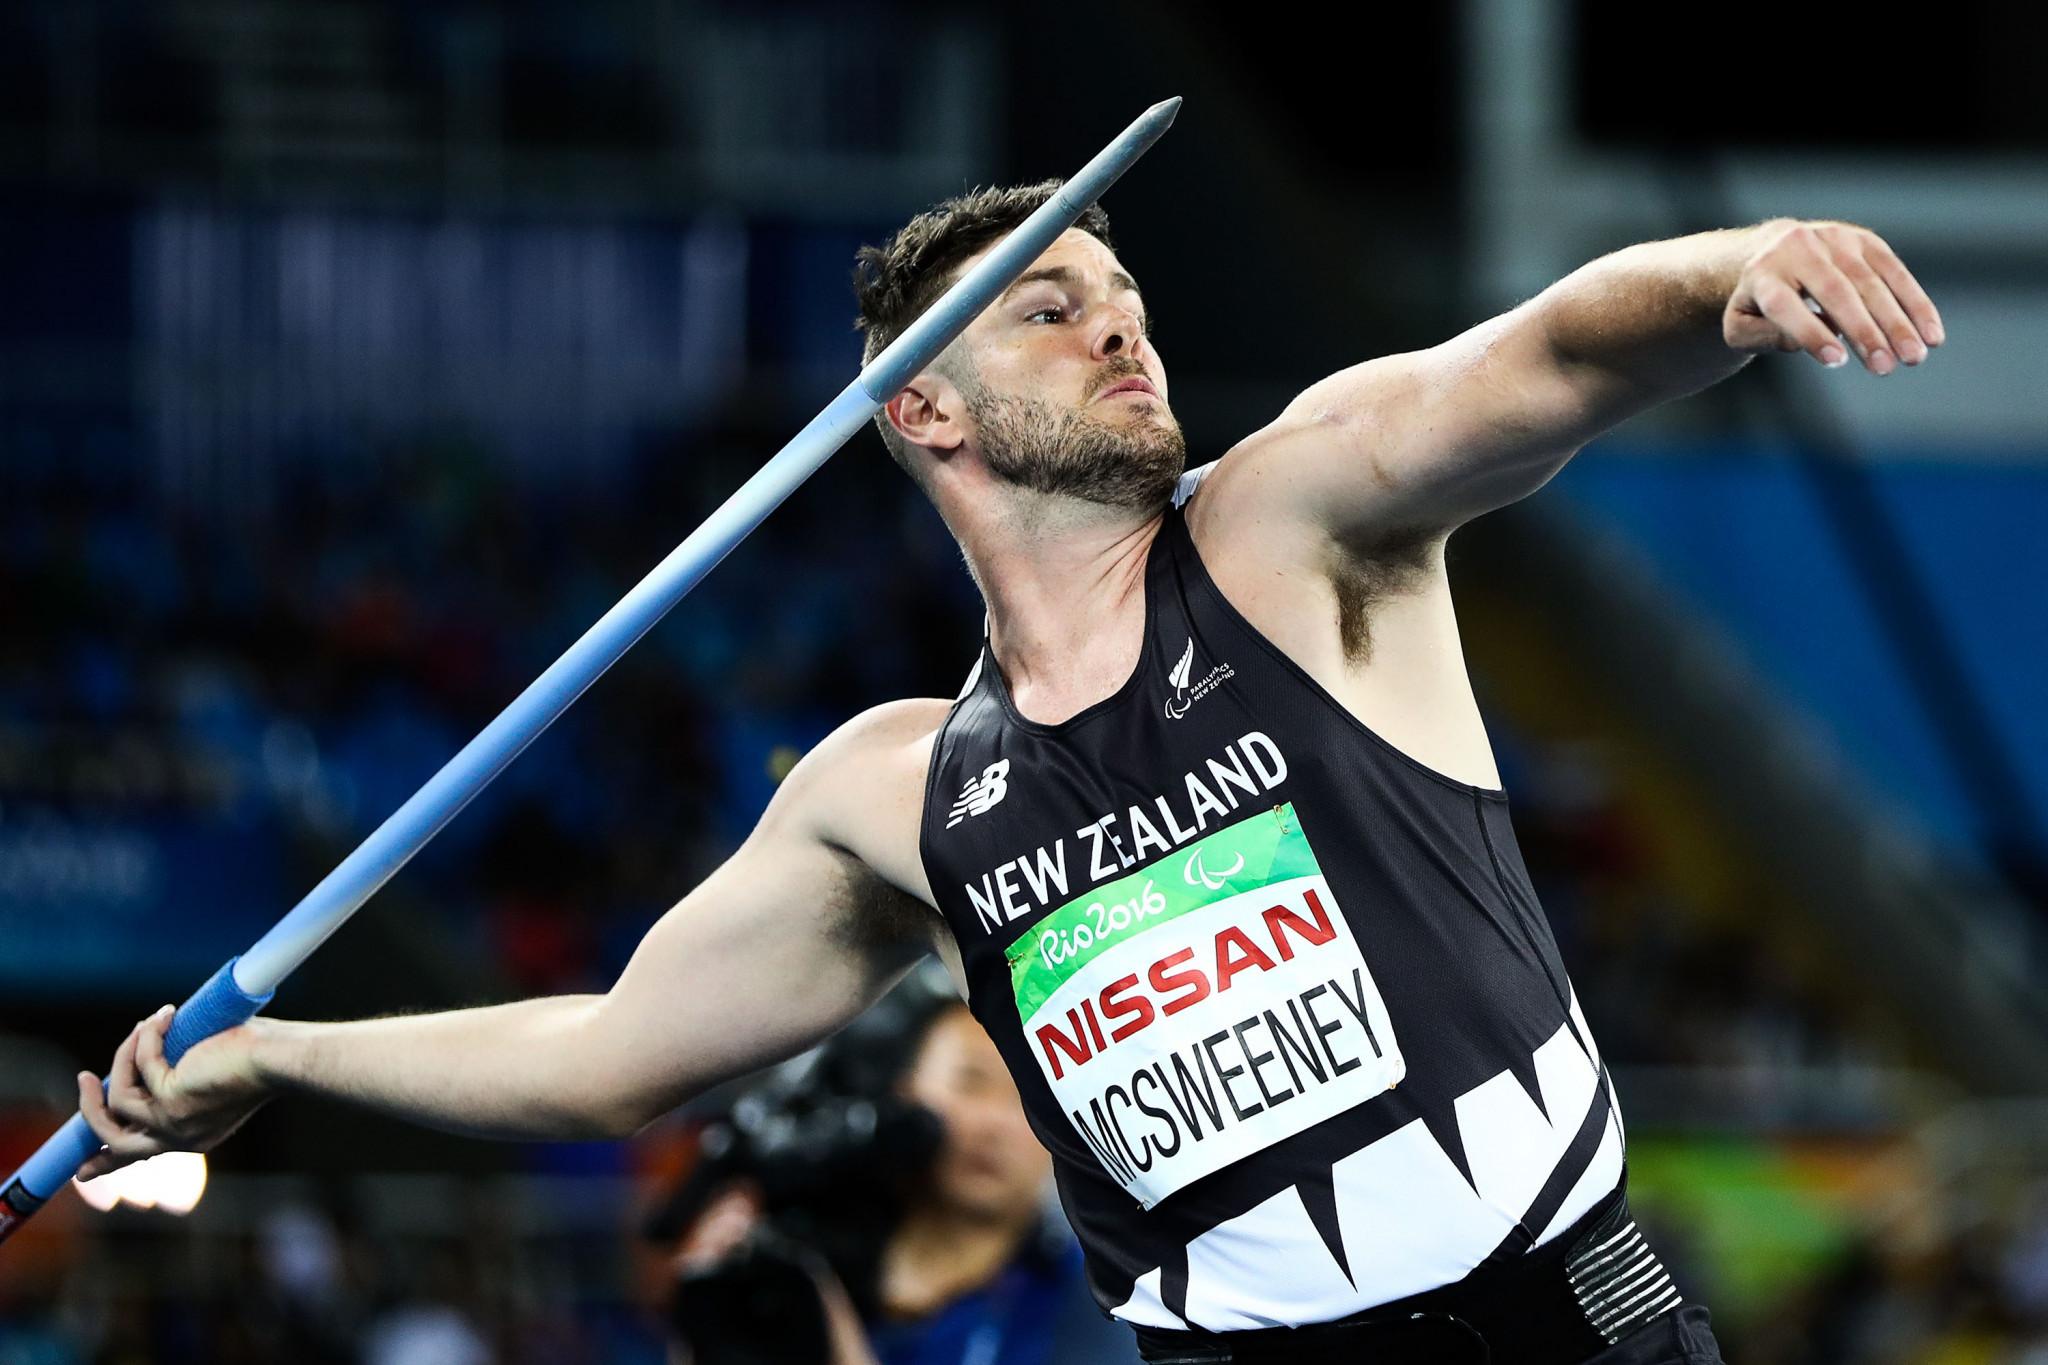 New Zealand Paralympic javelin bronze medallist announces retirement